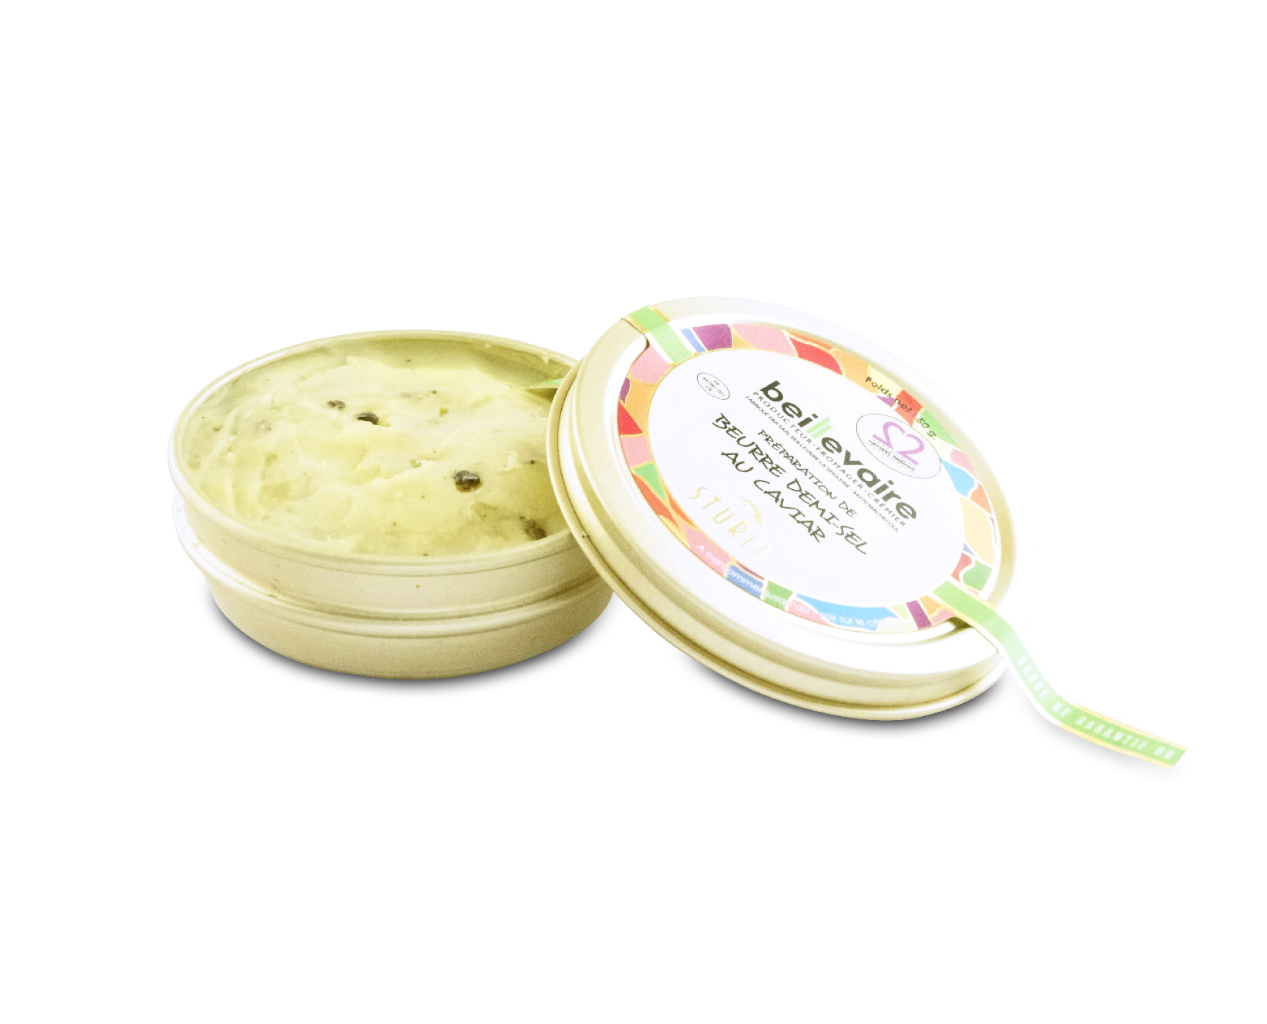 Beurre artisanal au caviar, Beillevaire (50 g)